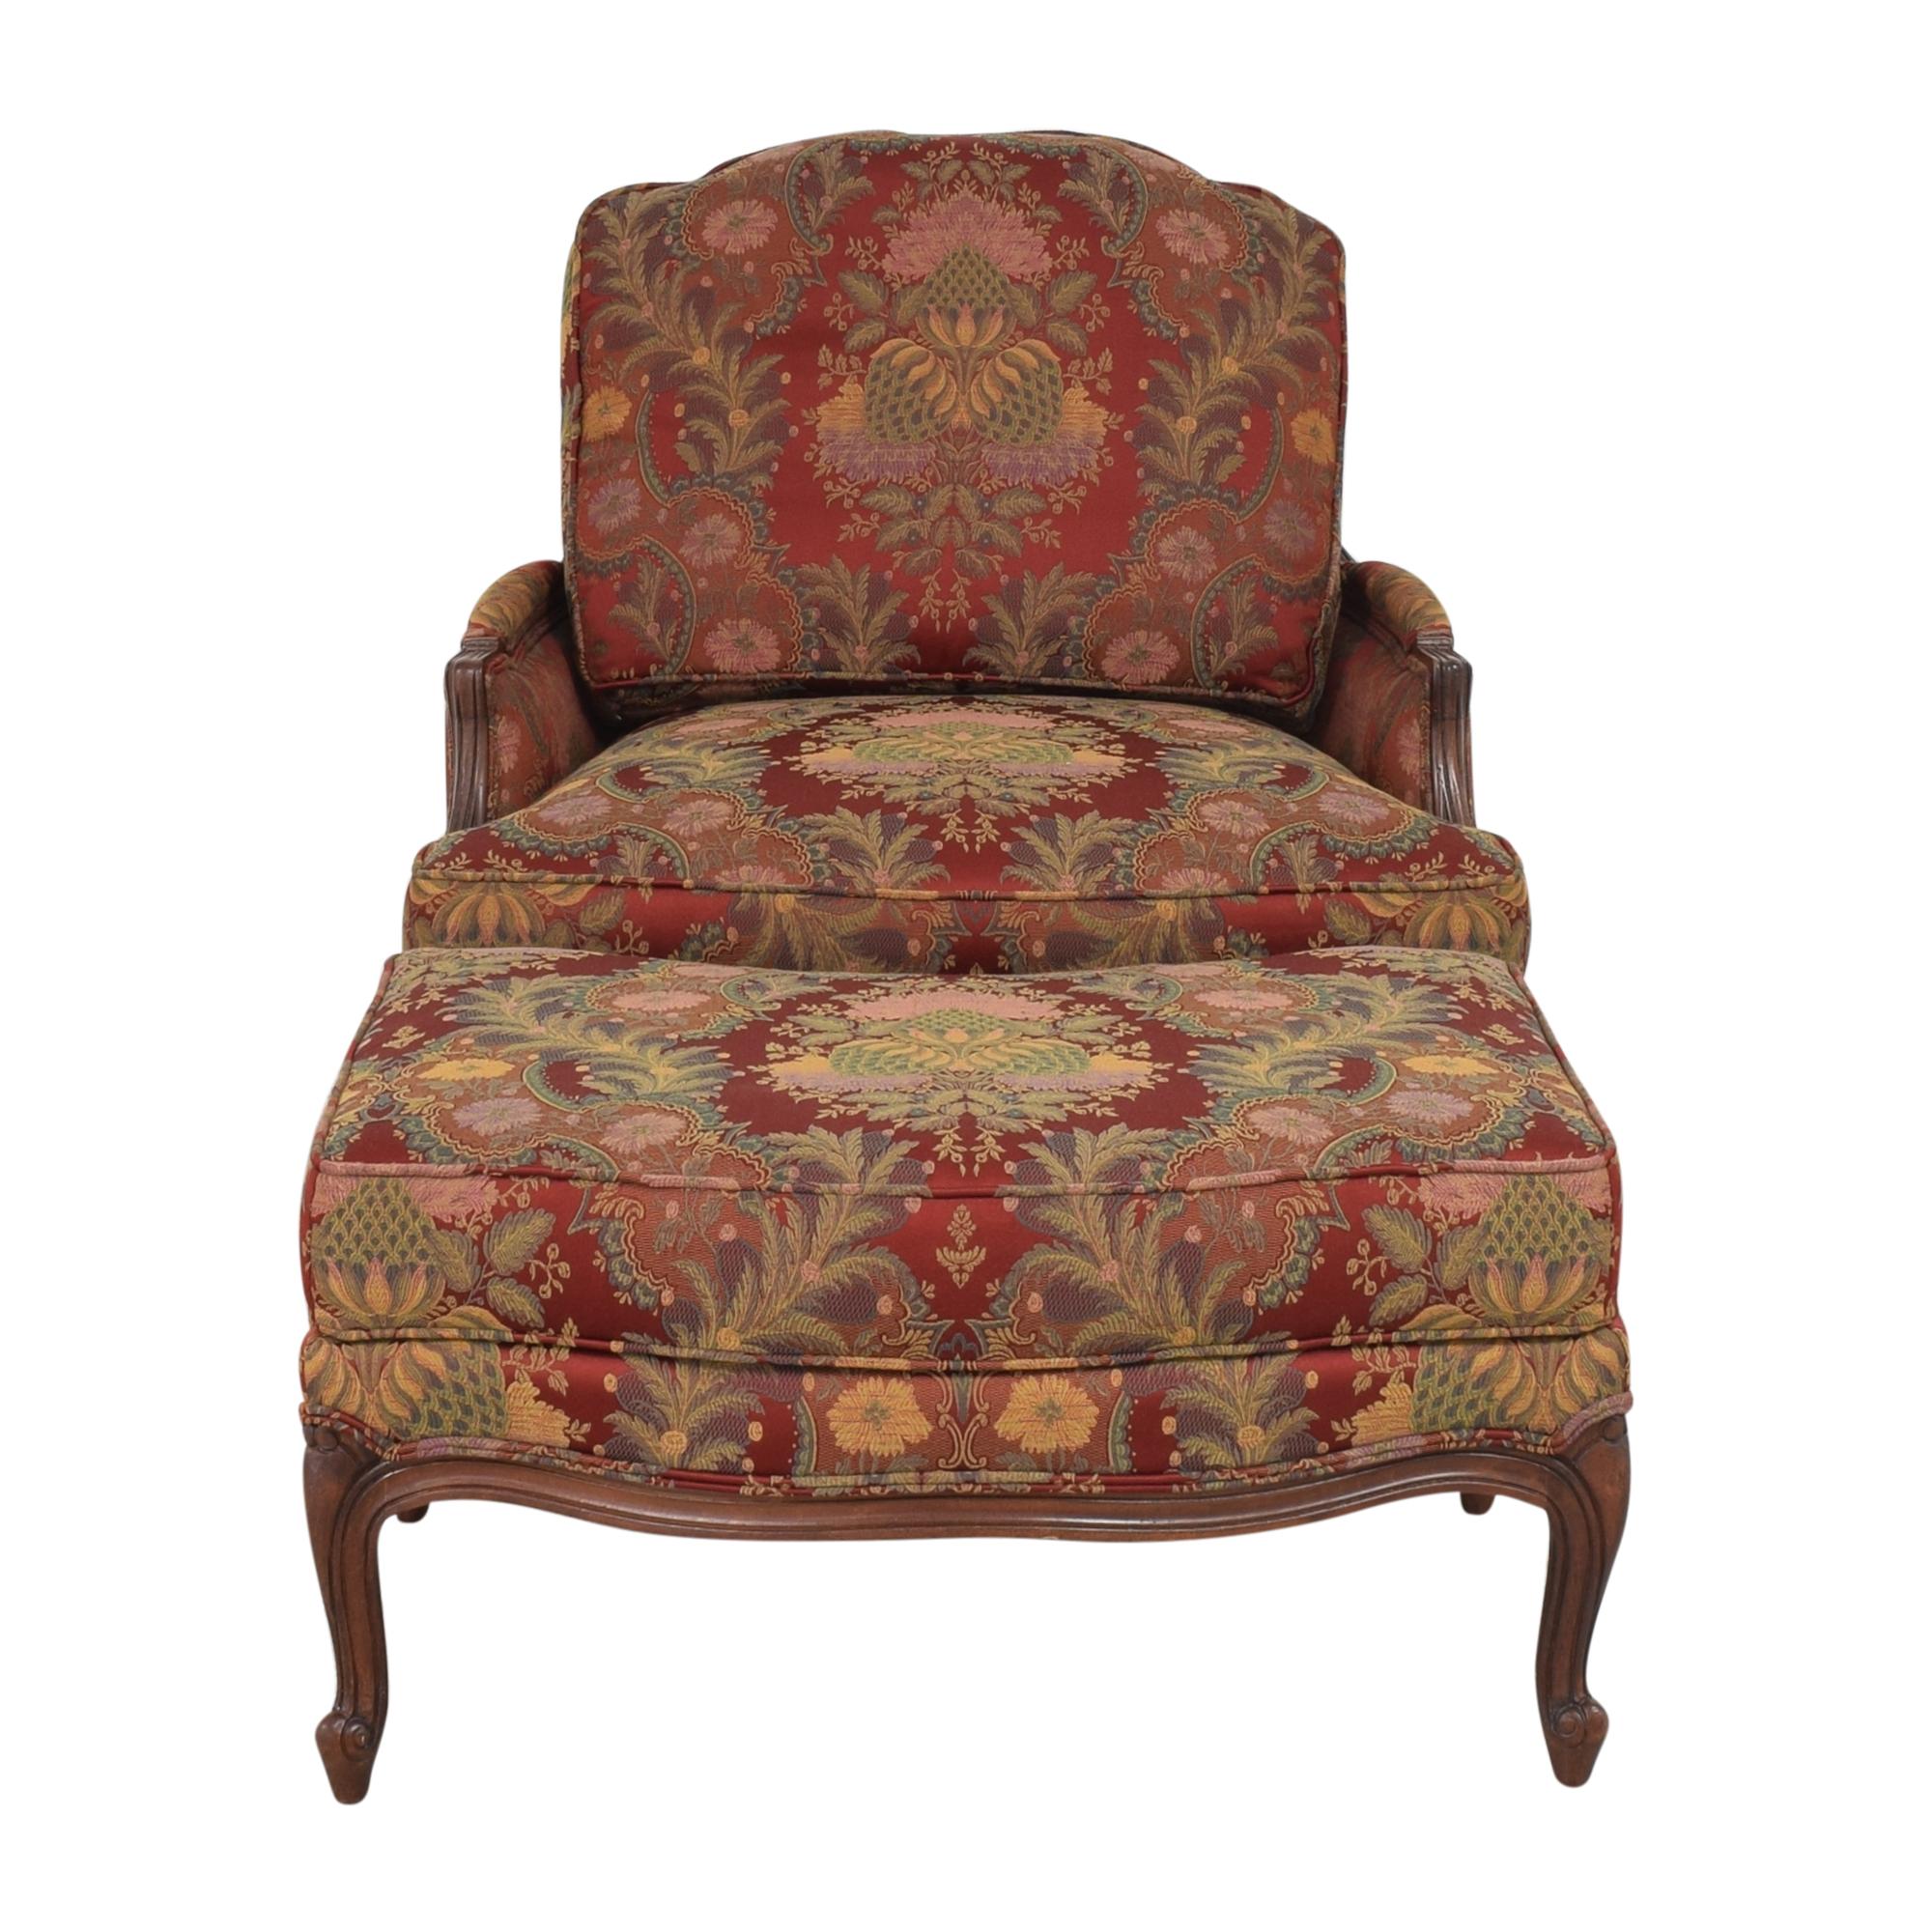 buy Ethan Allen Versailles Chair with Ottoman Ethan Allen Chairs